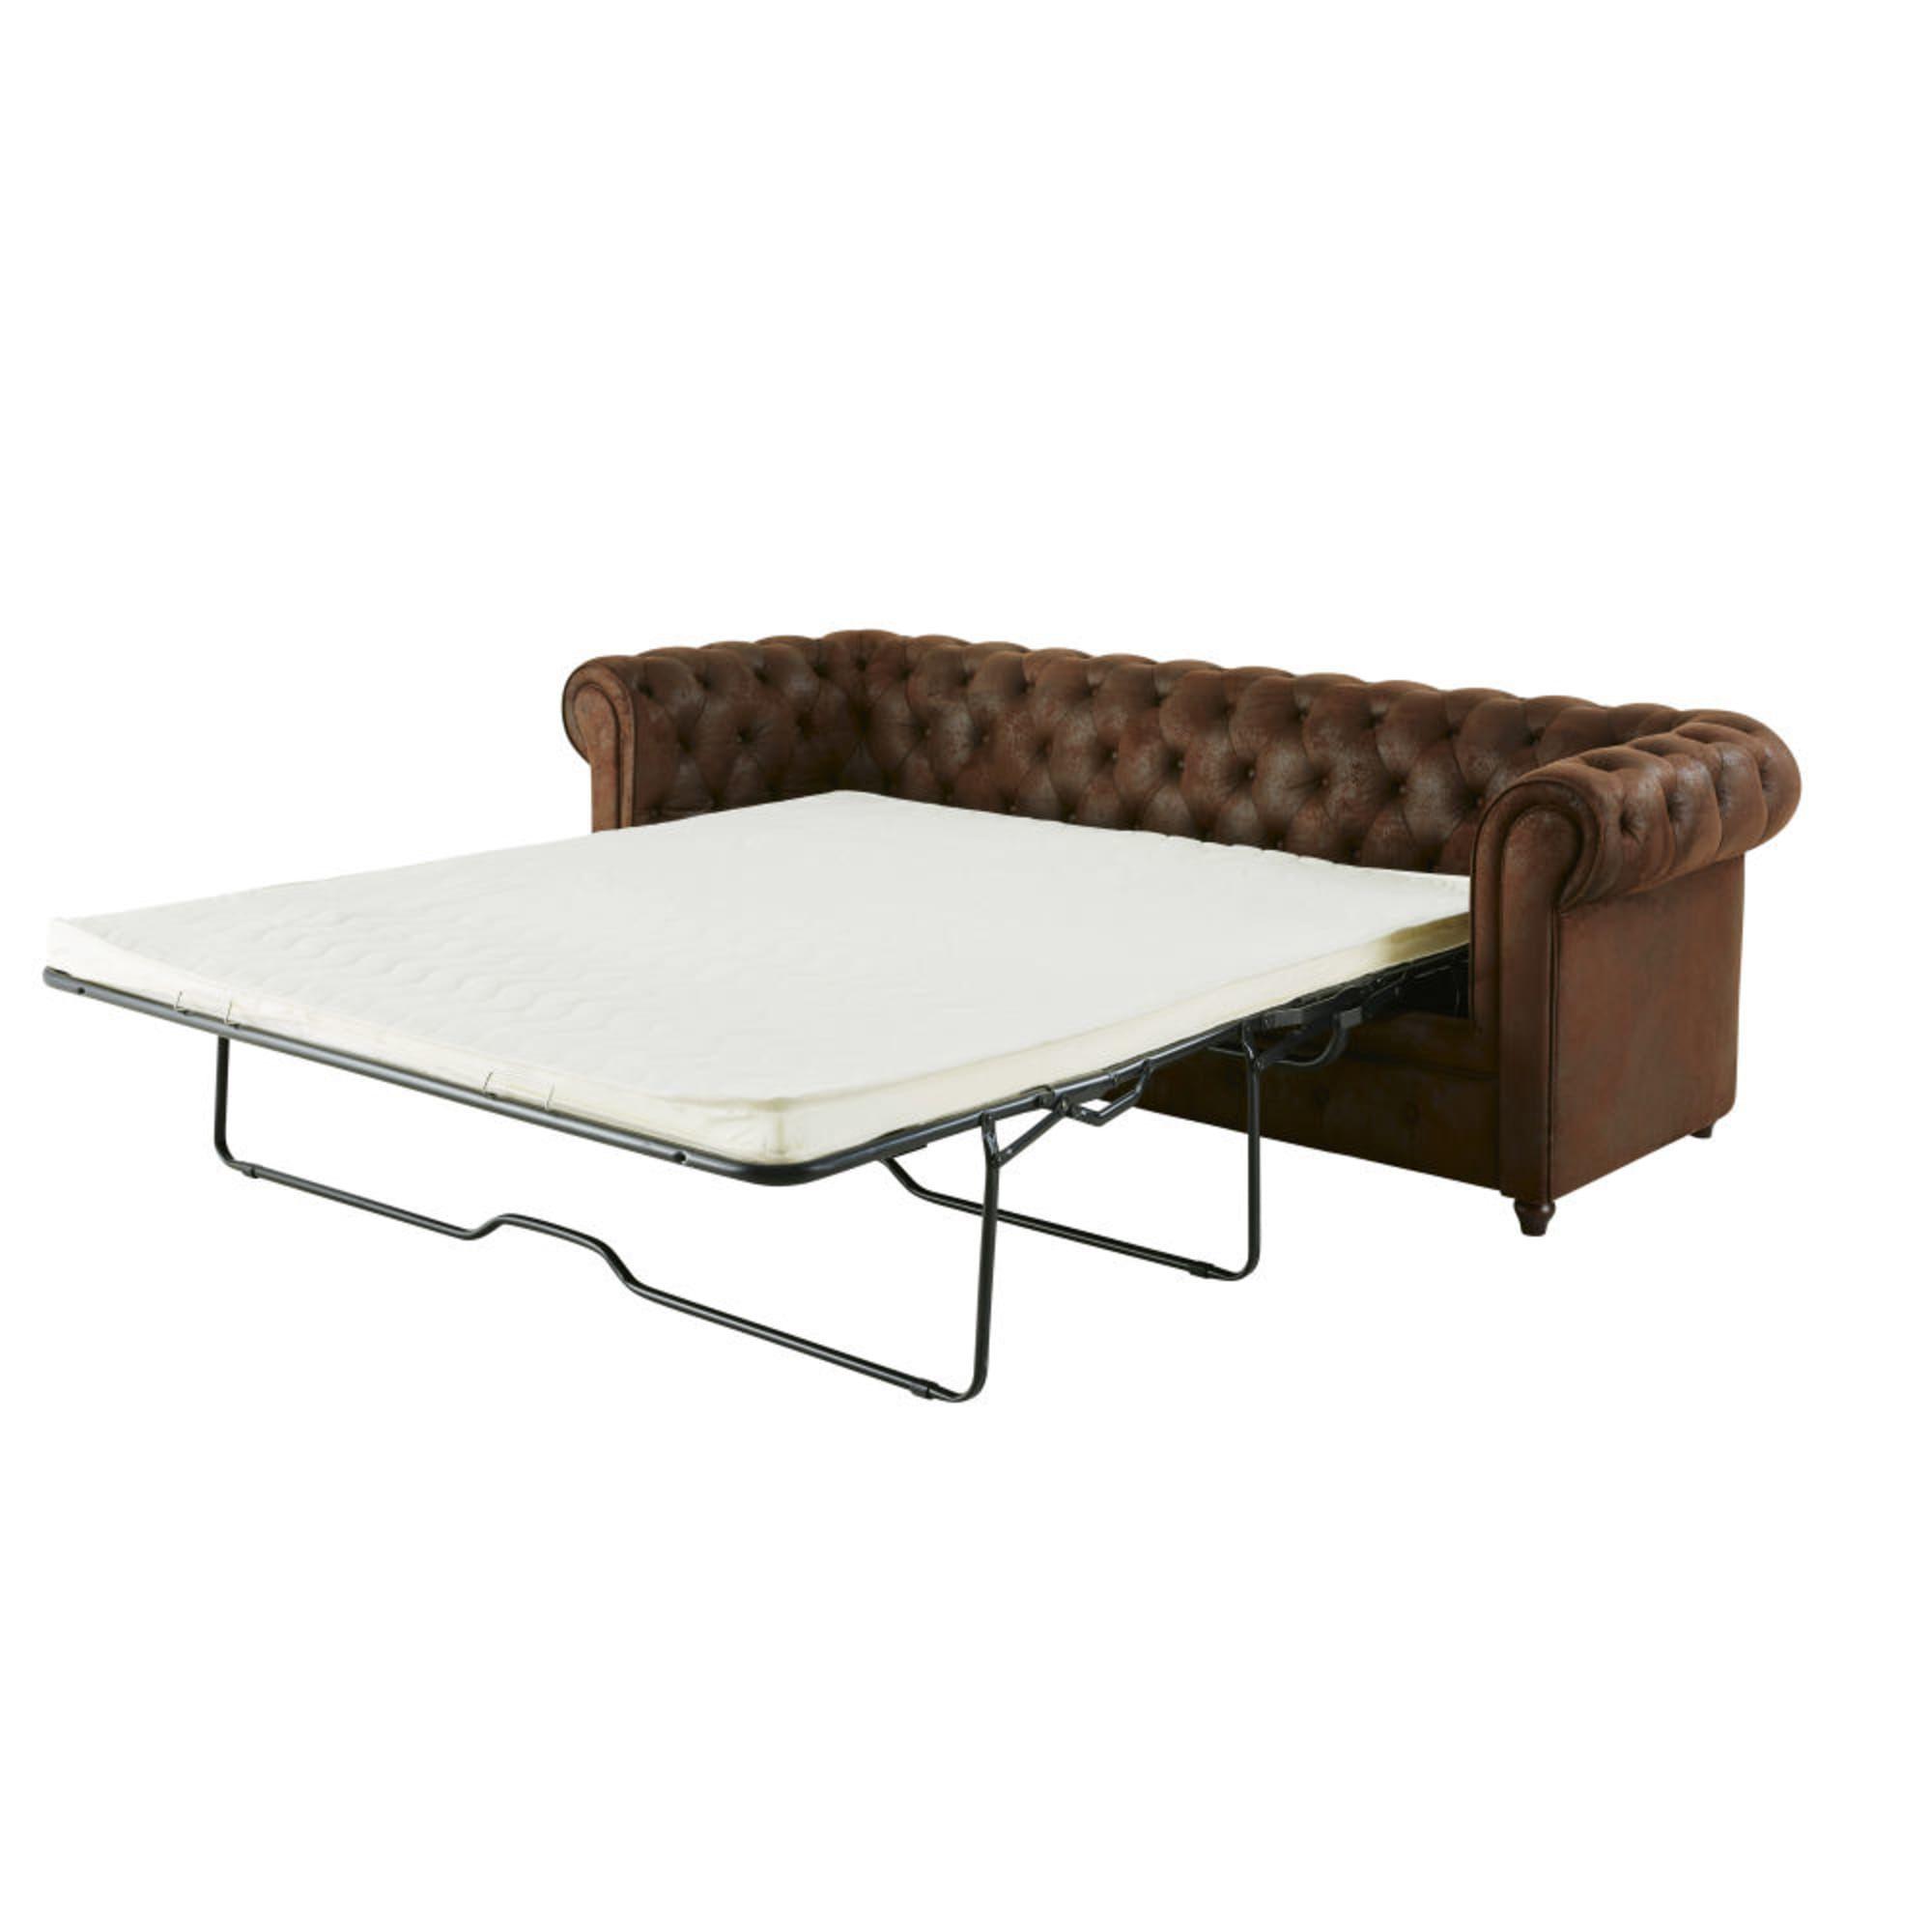 Canape Lit Capitonne 3 Places En Suedine Marron Outdoor Furniture Outdoor Decor Furniture